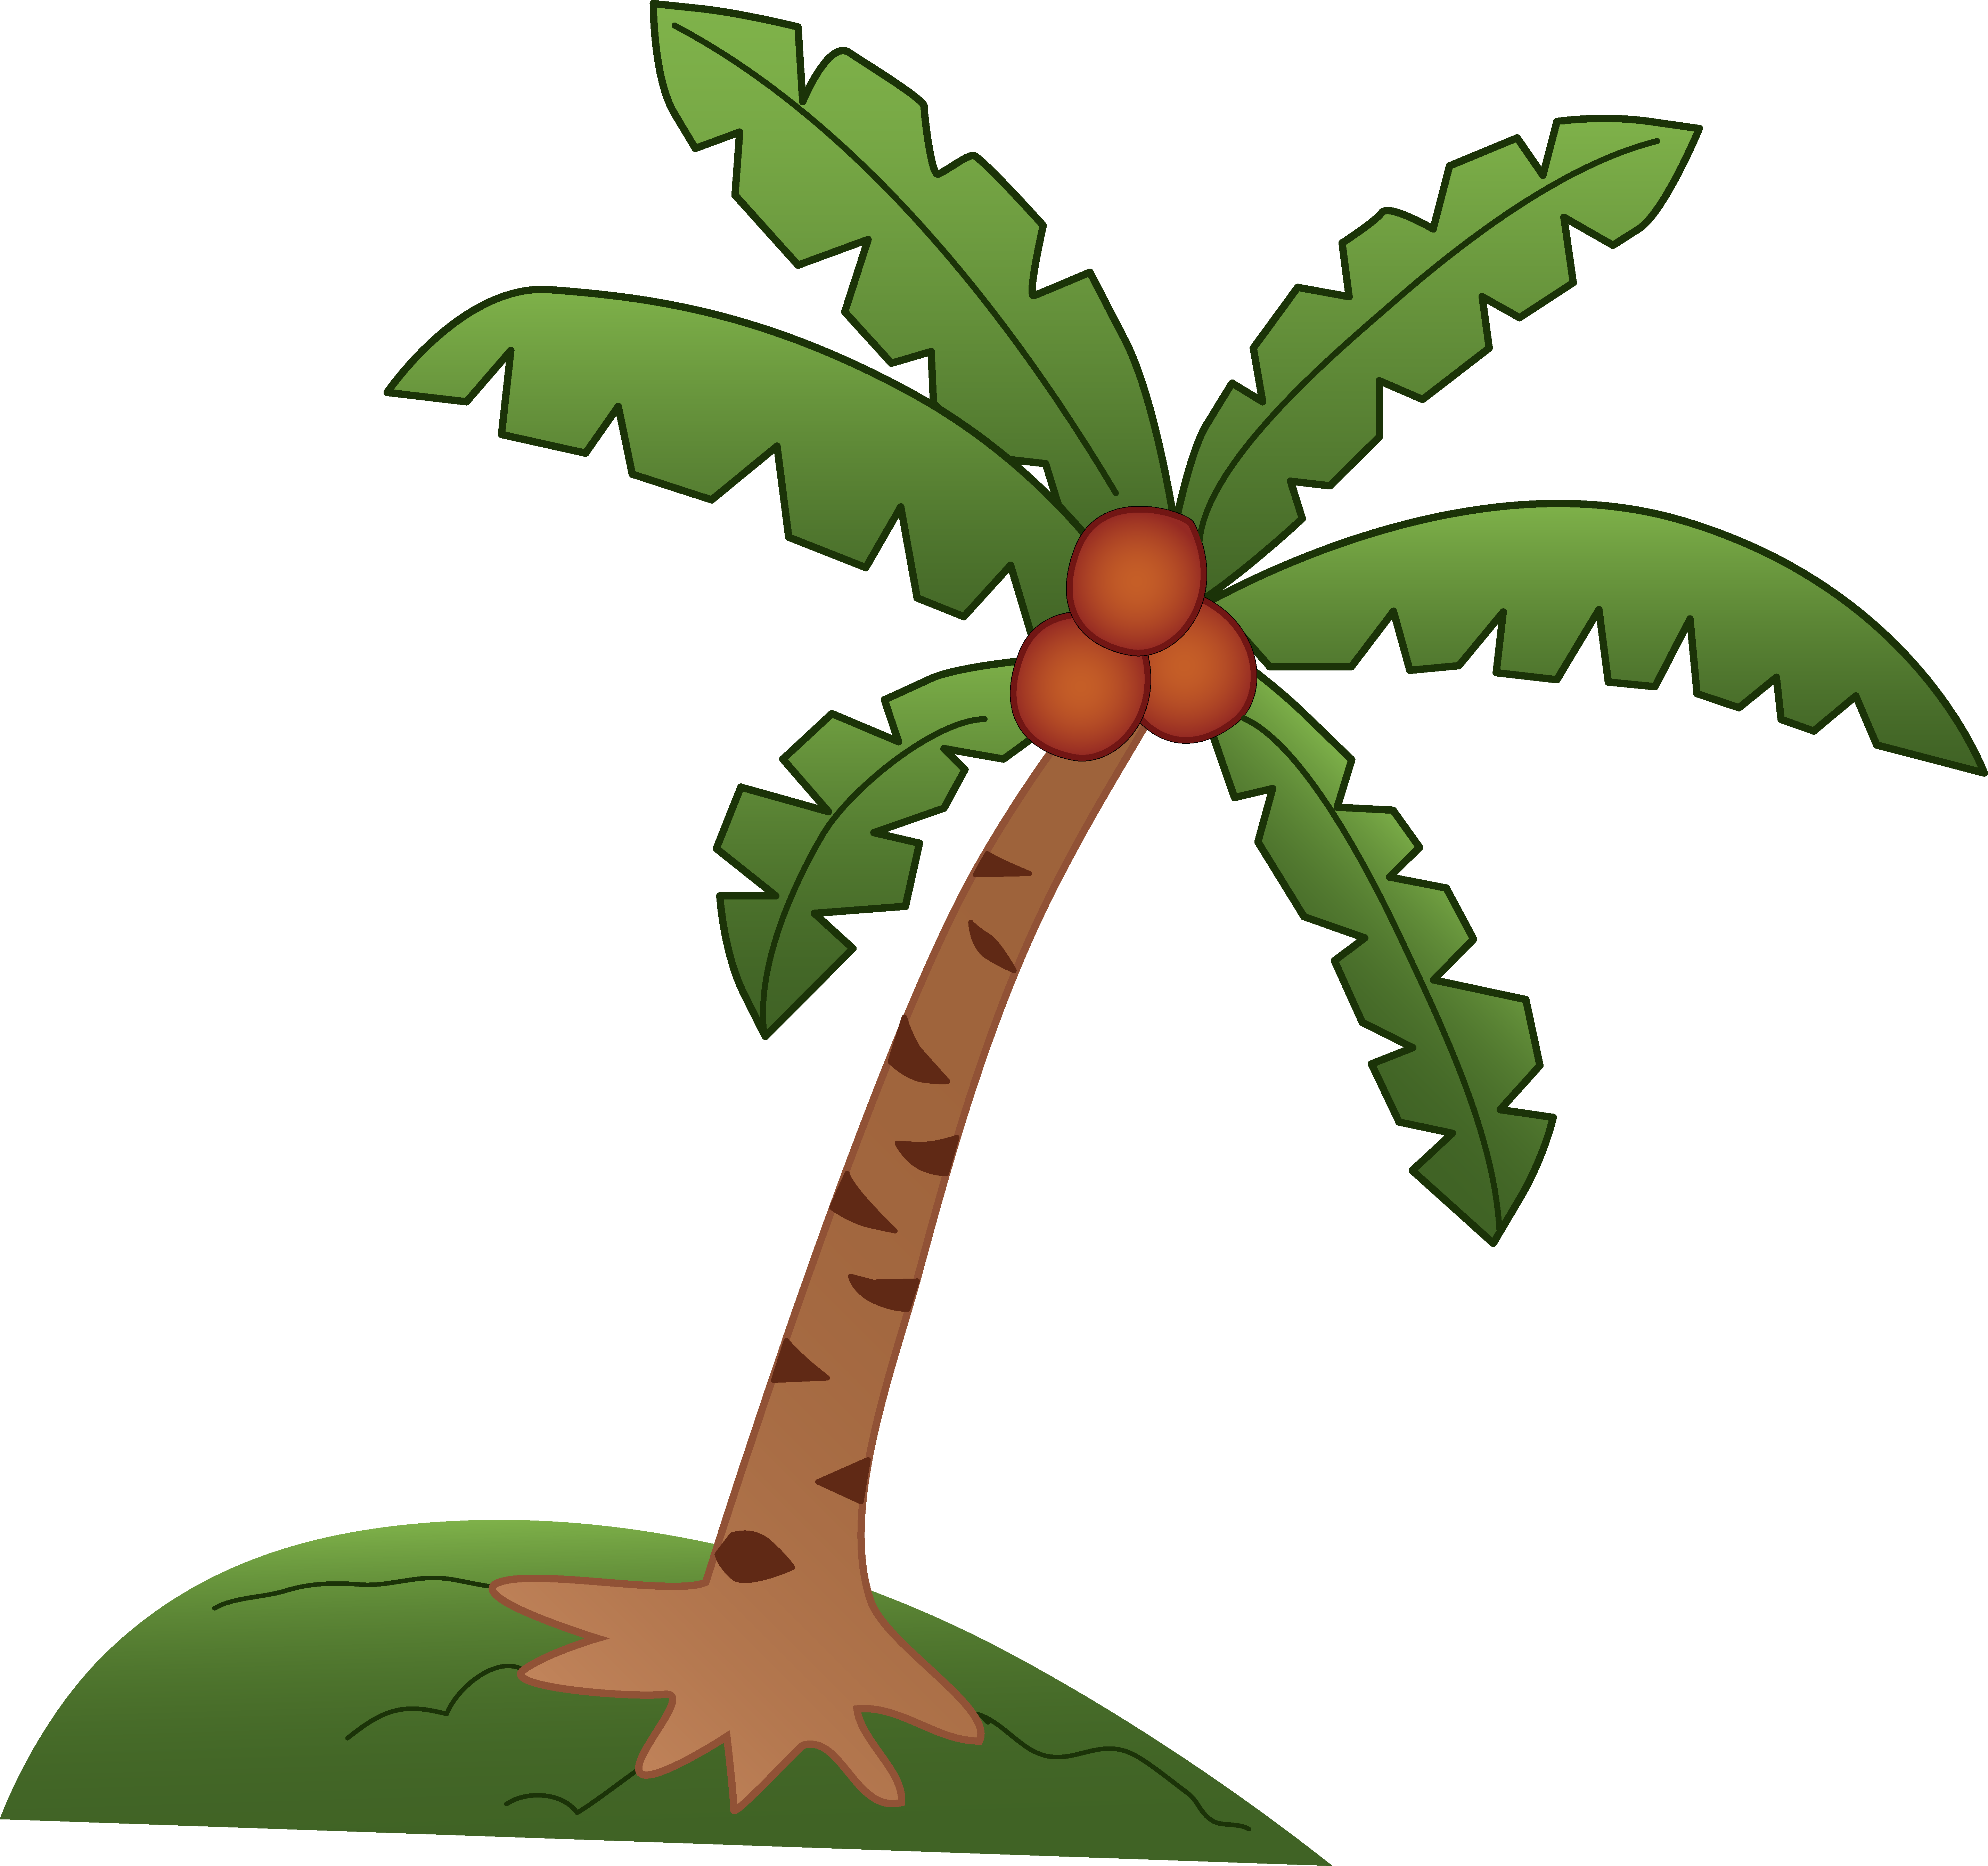 coconut clipart - Coconut Tree Clipart